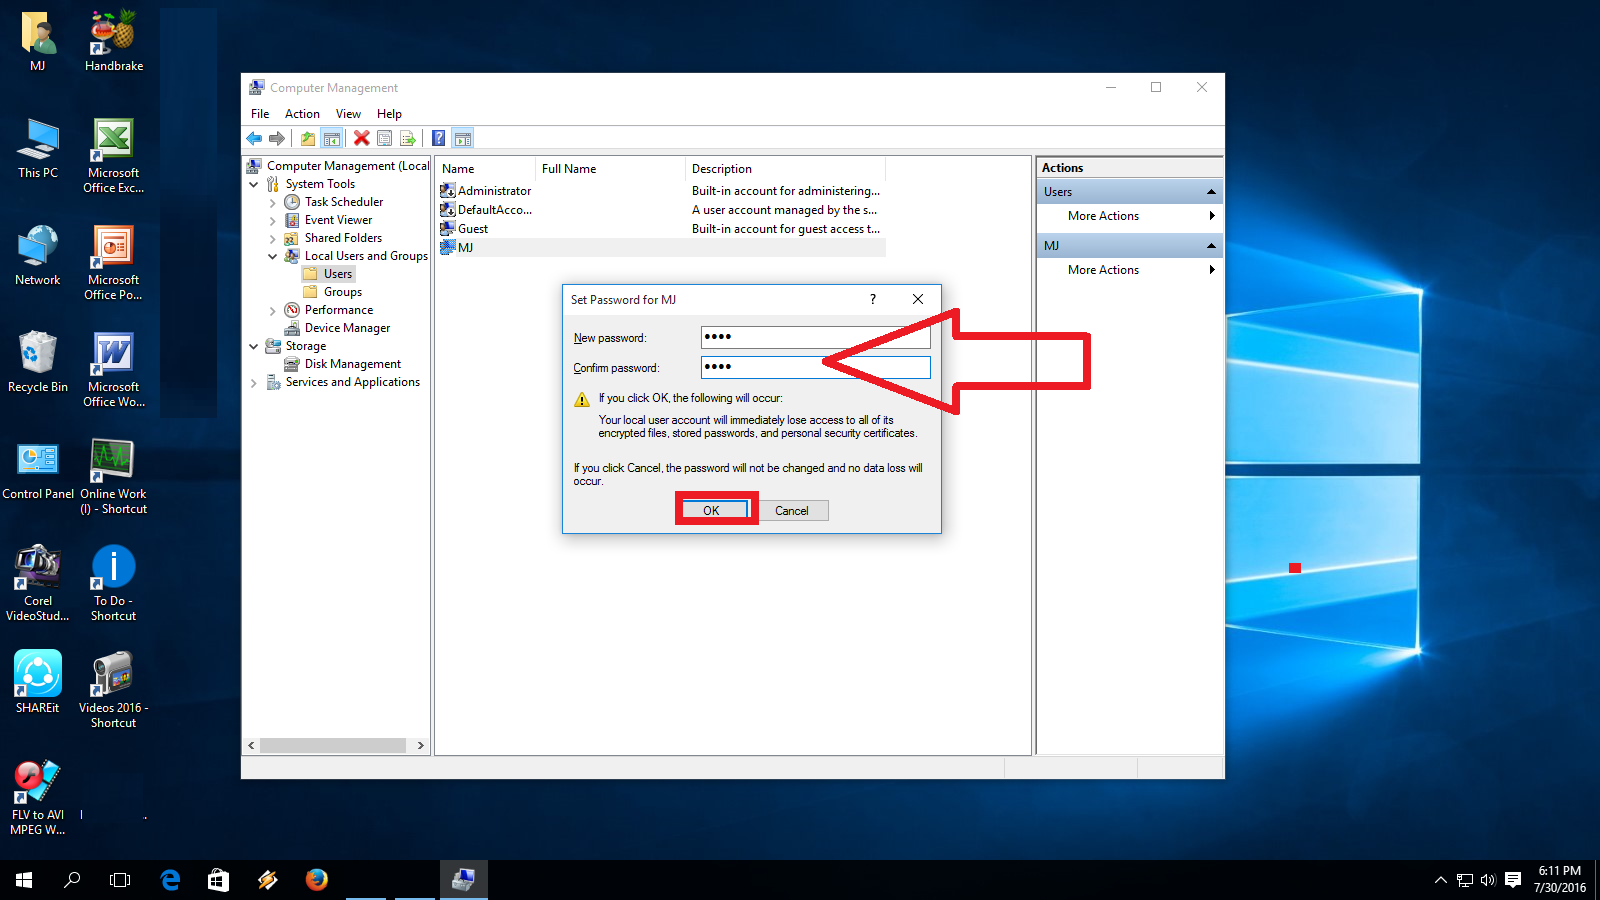 windows pc how to change username